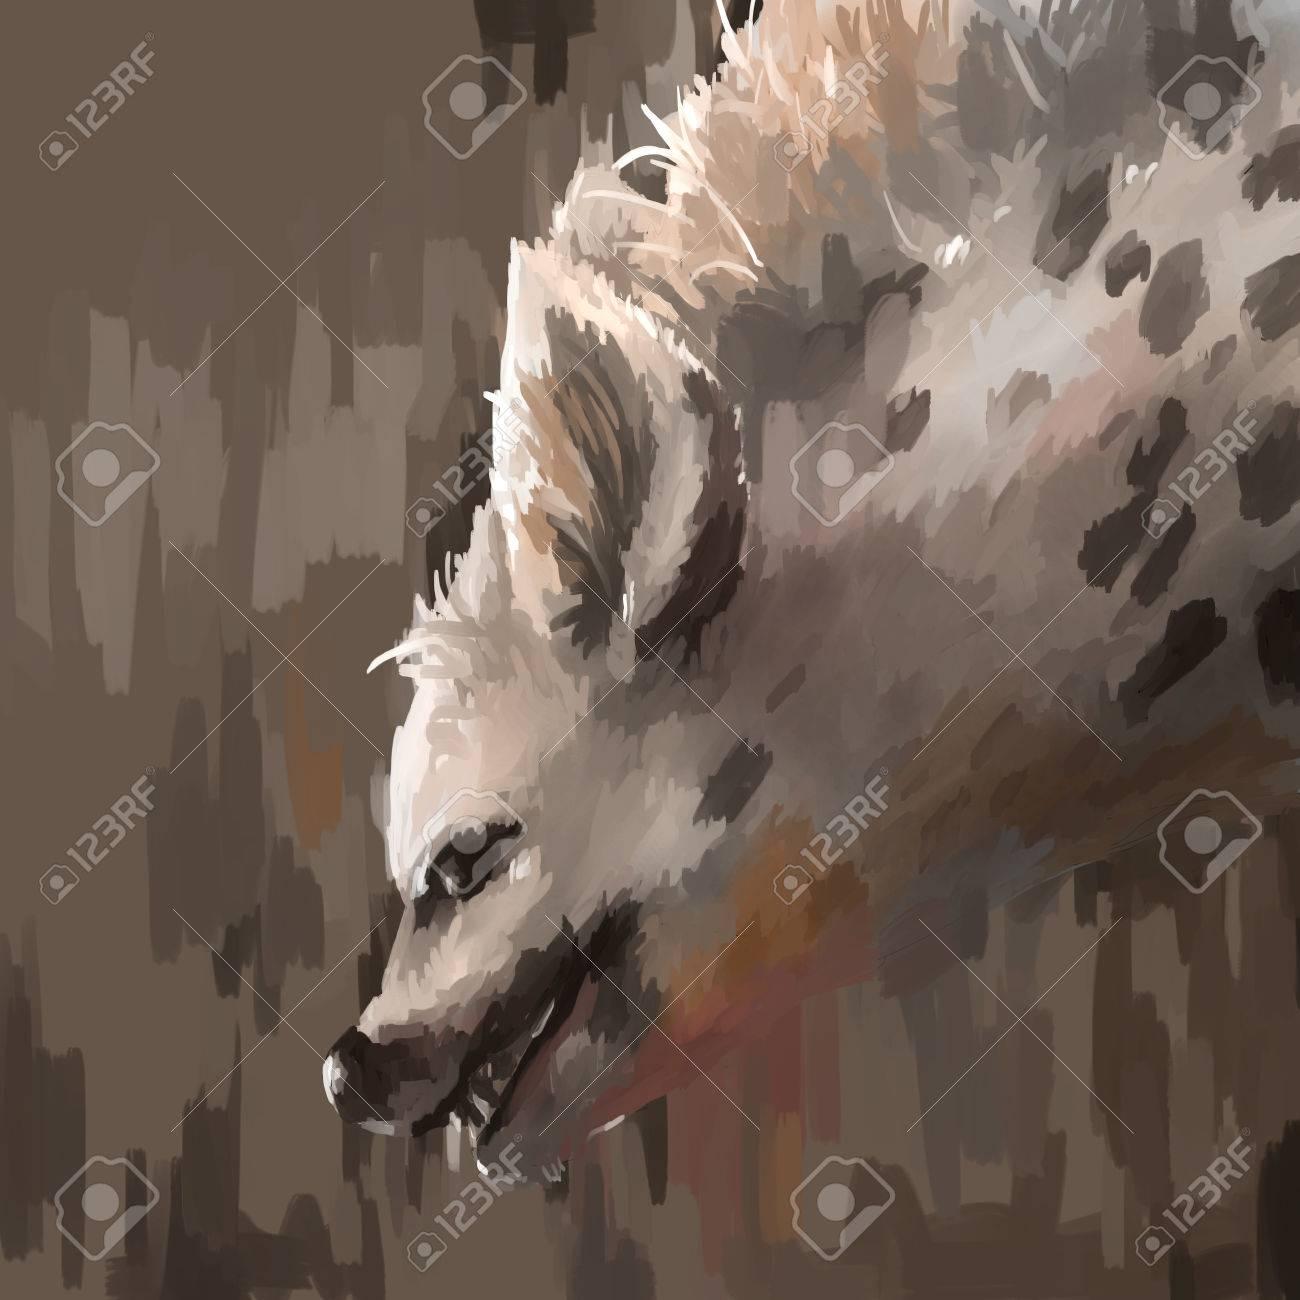 illustration digital painting animal hyena - 55105530